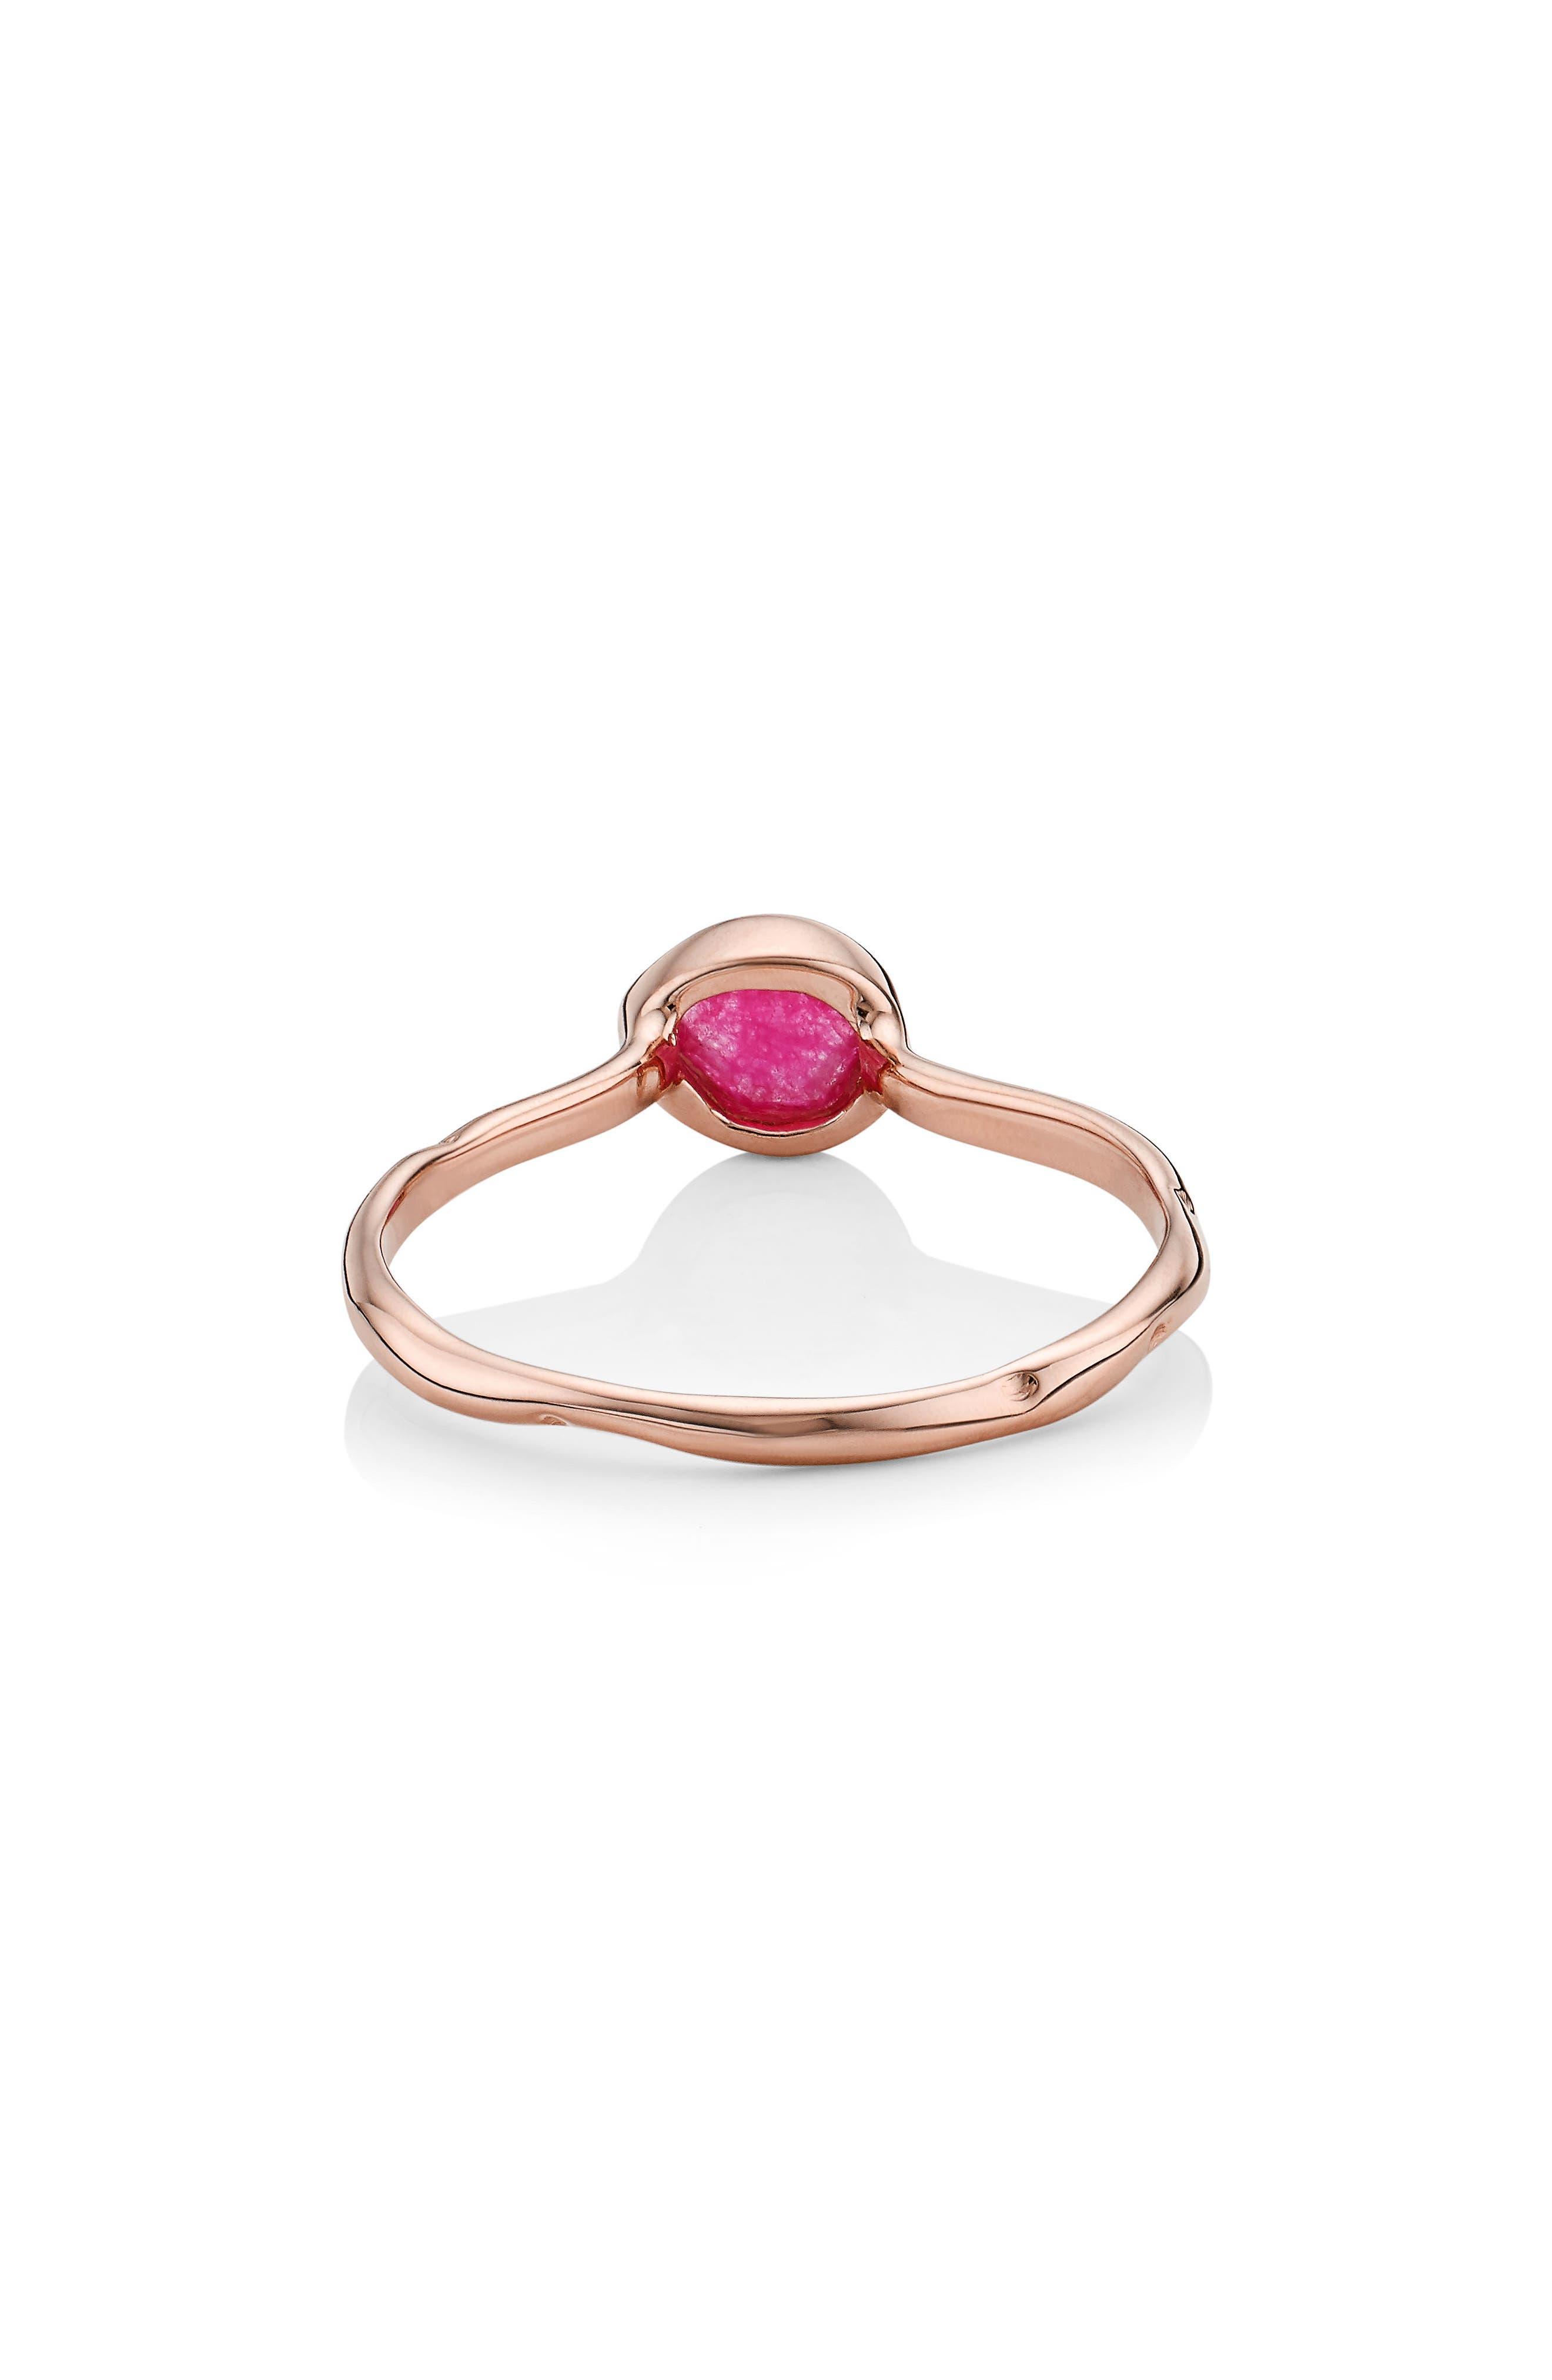 'Siren' Small Stacking Ring,                             Alternate thumbnail 3, color,                             PINK QUARTZ/ ROSE GOLD